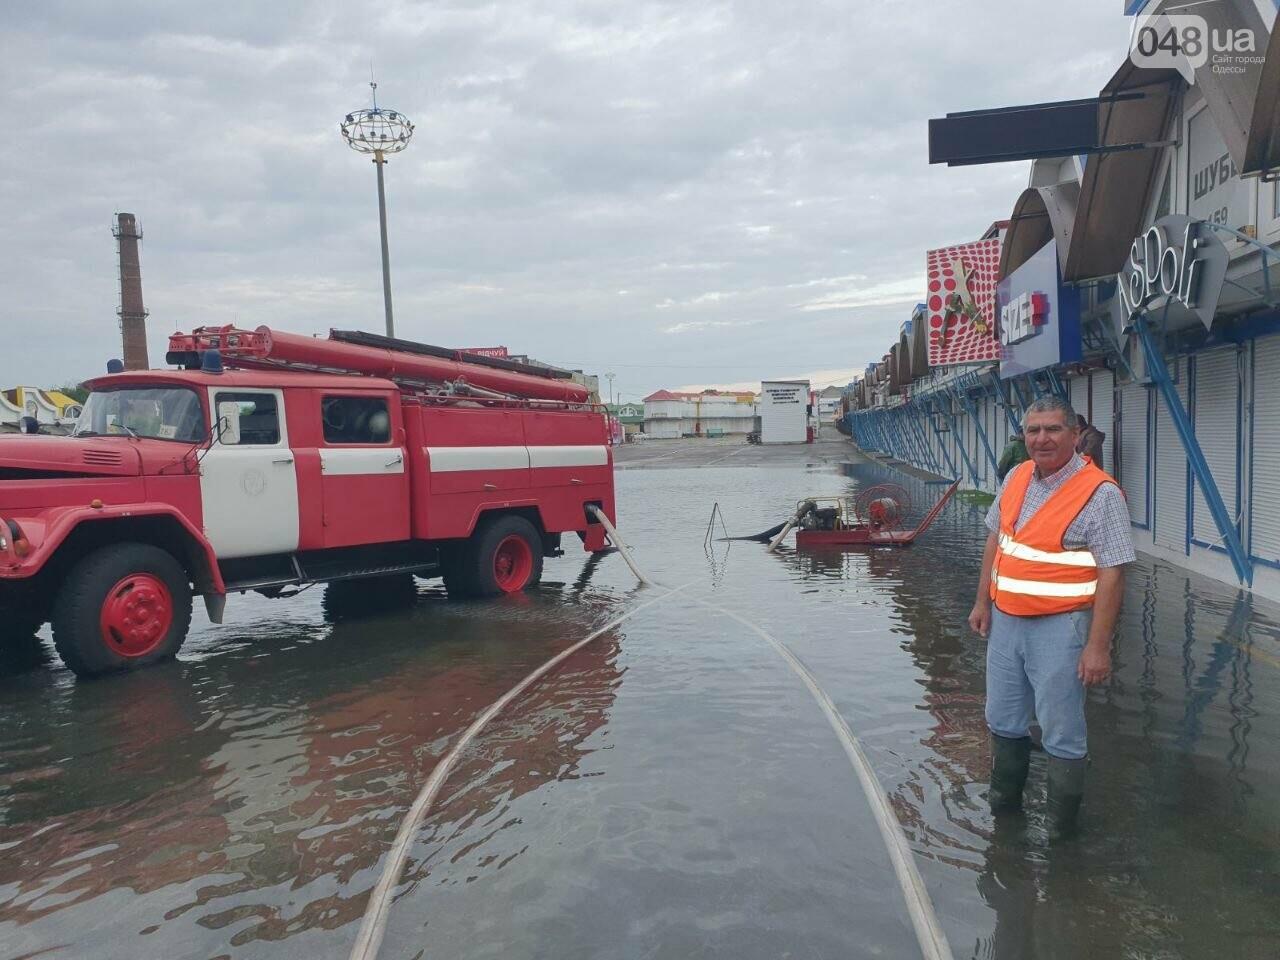 На промрынке 7км в Одессе образовалось море, - ФОТО, фото-16